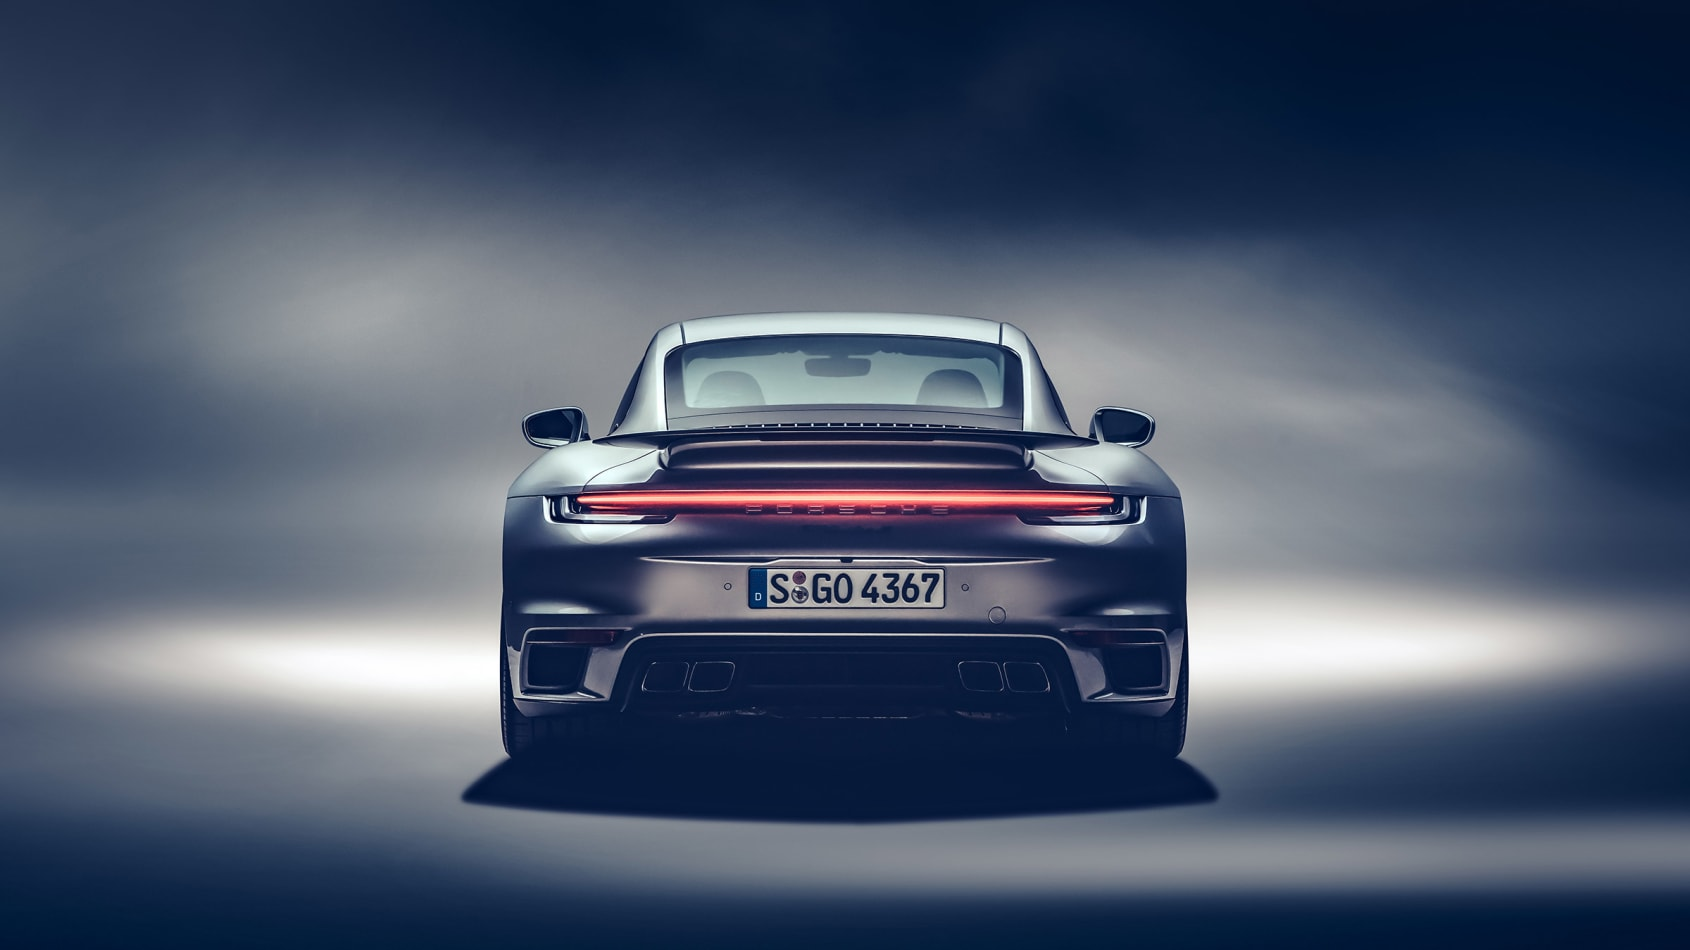 Petrolhead Corner - 2020 Porsche 911 Turbo S 992 - 4